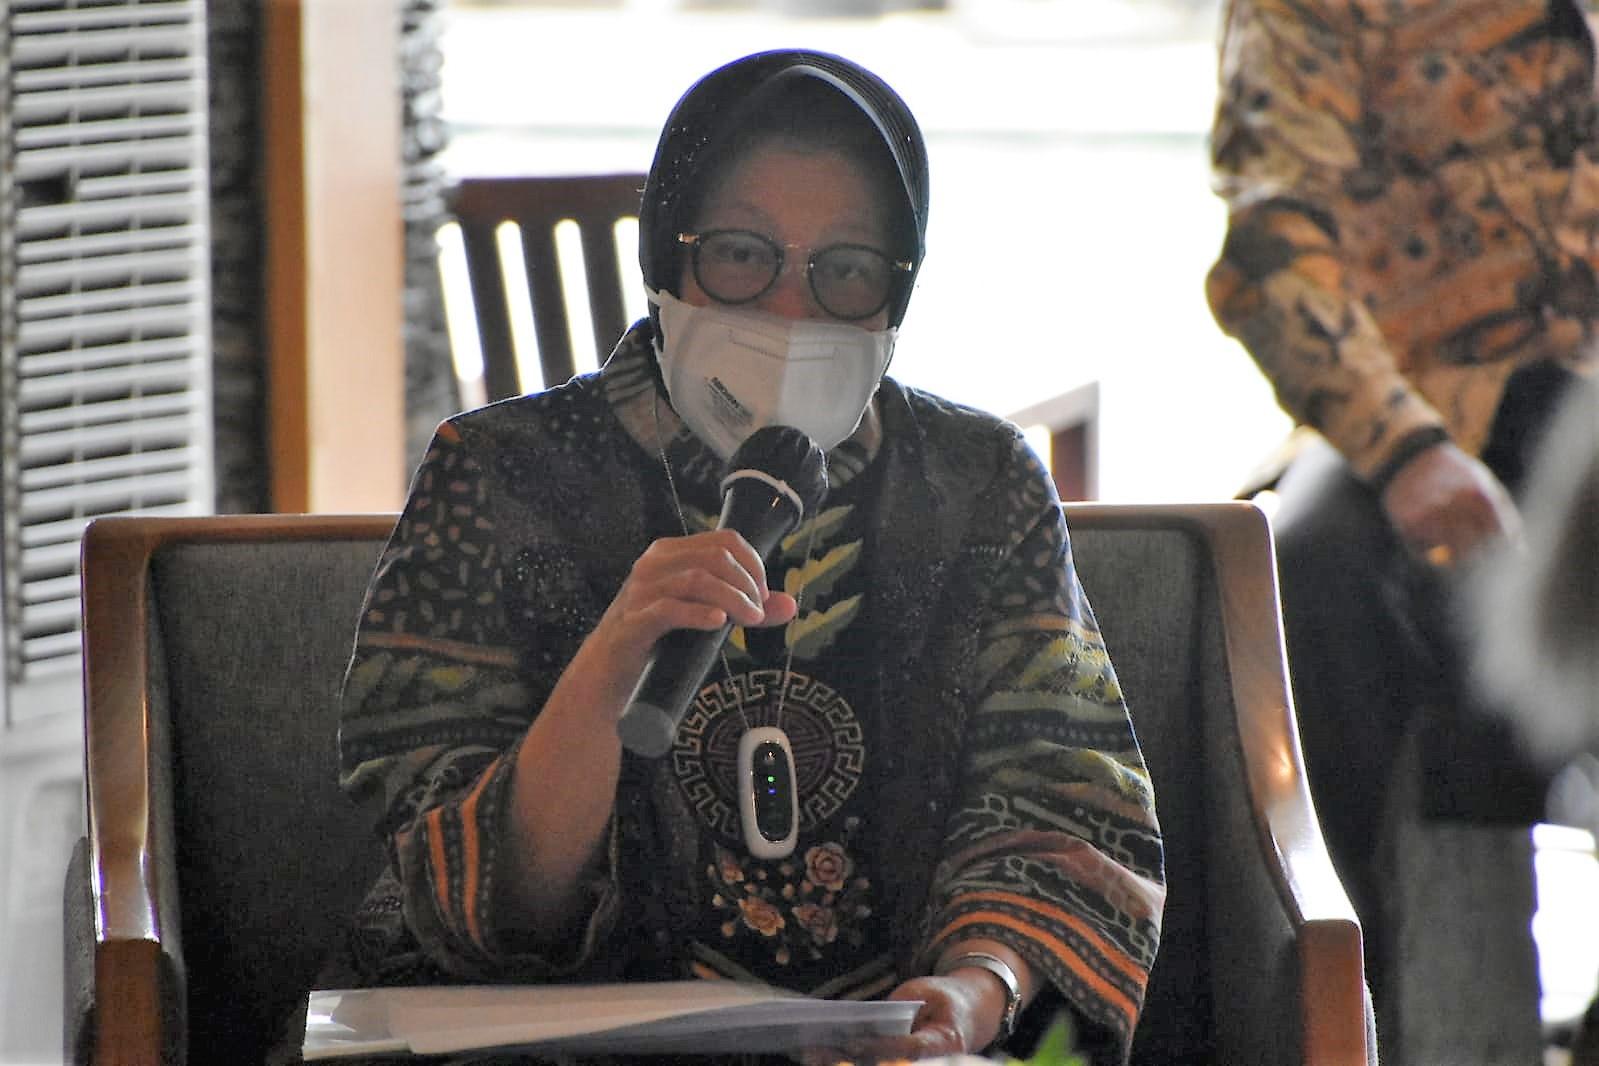 Kemensos Rekonsiliasi Data Penyaluran Bansos Kabupaten Jember dengan Mitra Penyalur